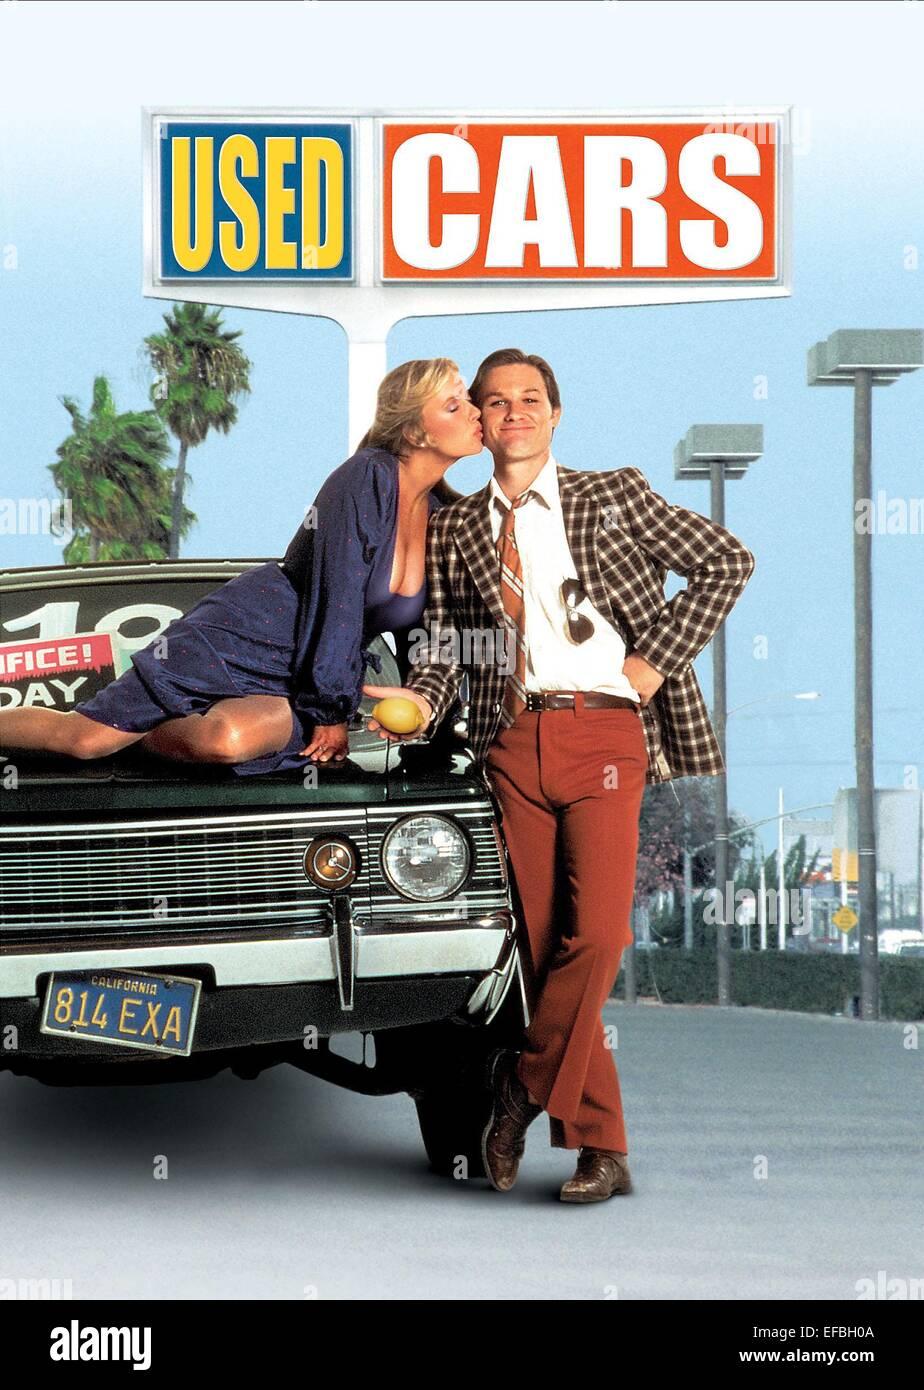 DEBORAH HARMON & KURT RUSSELL POSTER USED CARS (1980 Stock Photo ...